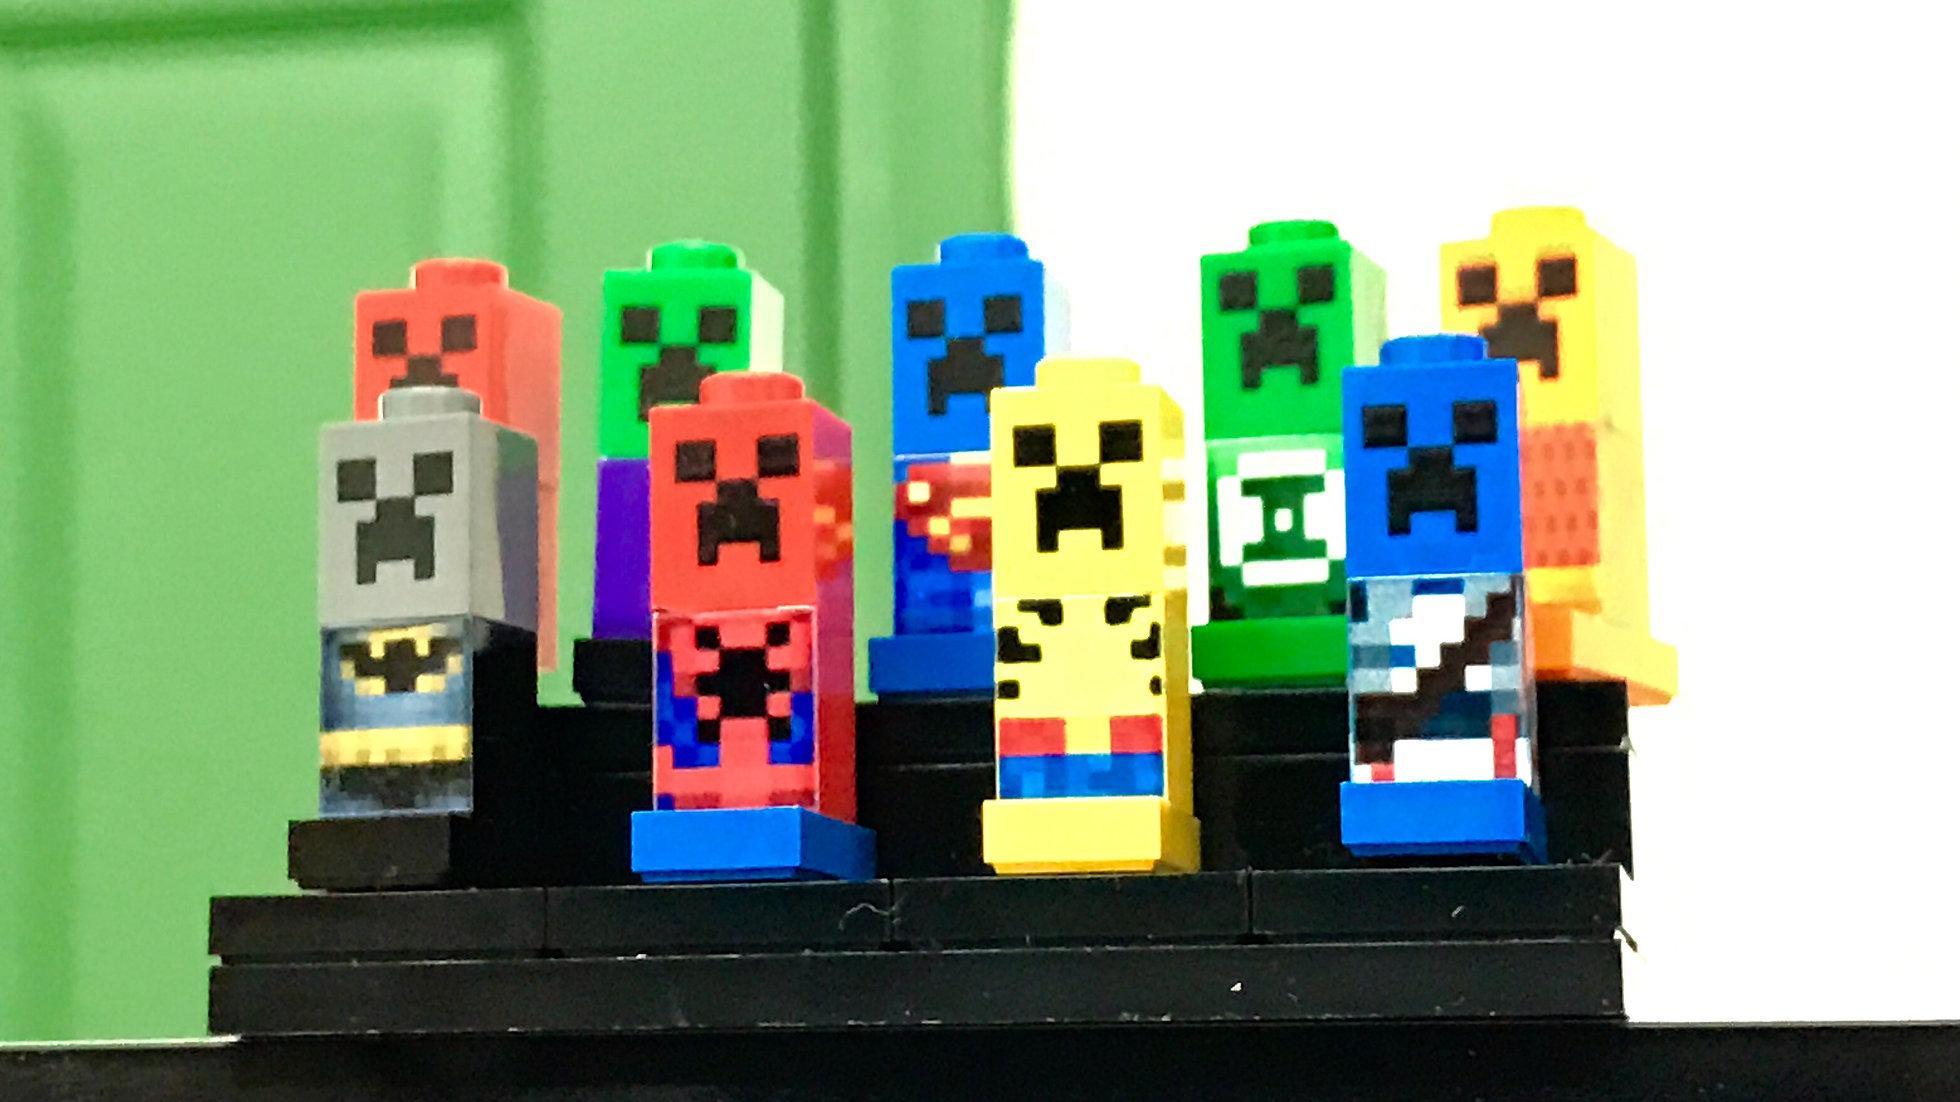 9x CreeperForce Customized print on LEGO brick - Micro World - Minecraft